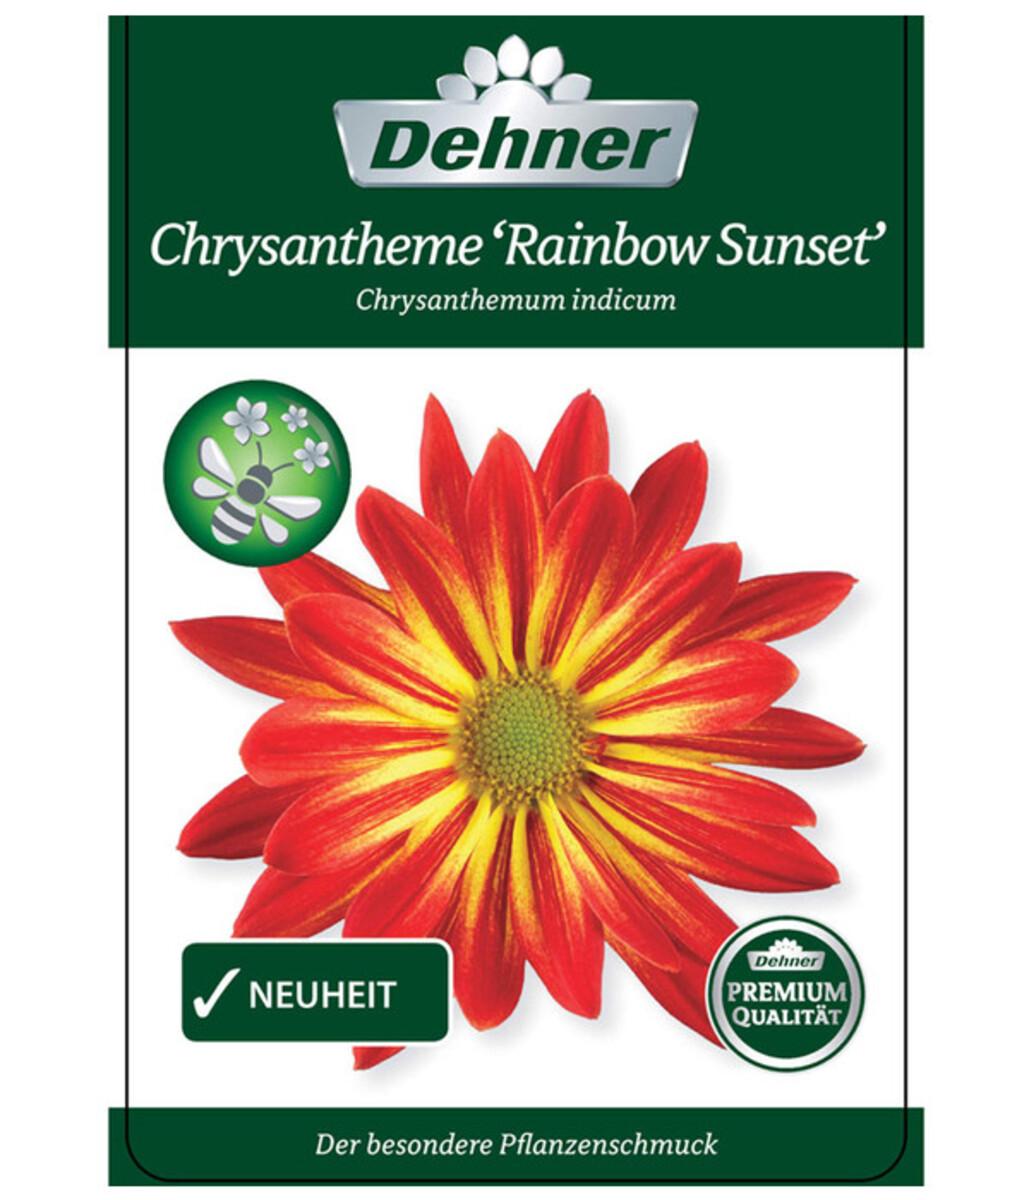 Bild 4 von Chrysantheme 'Rainbow Sunset'